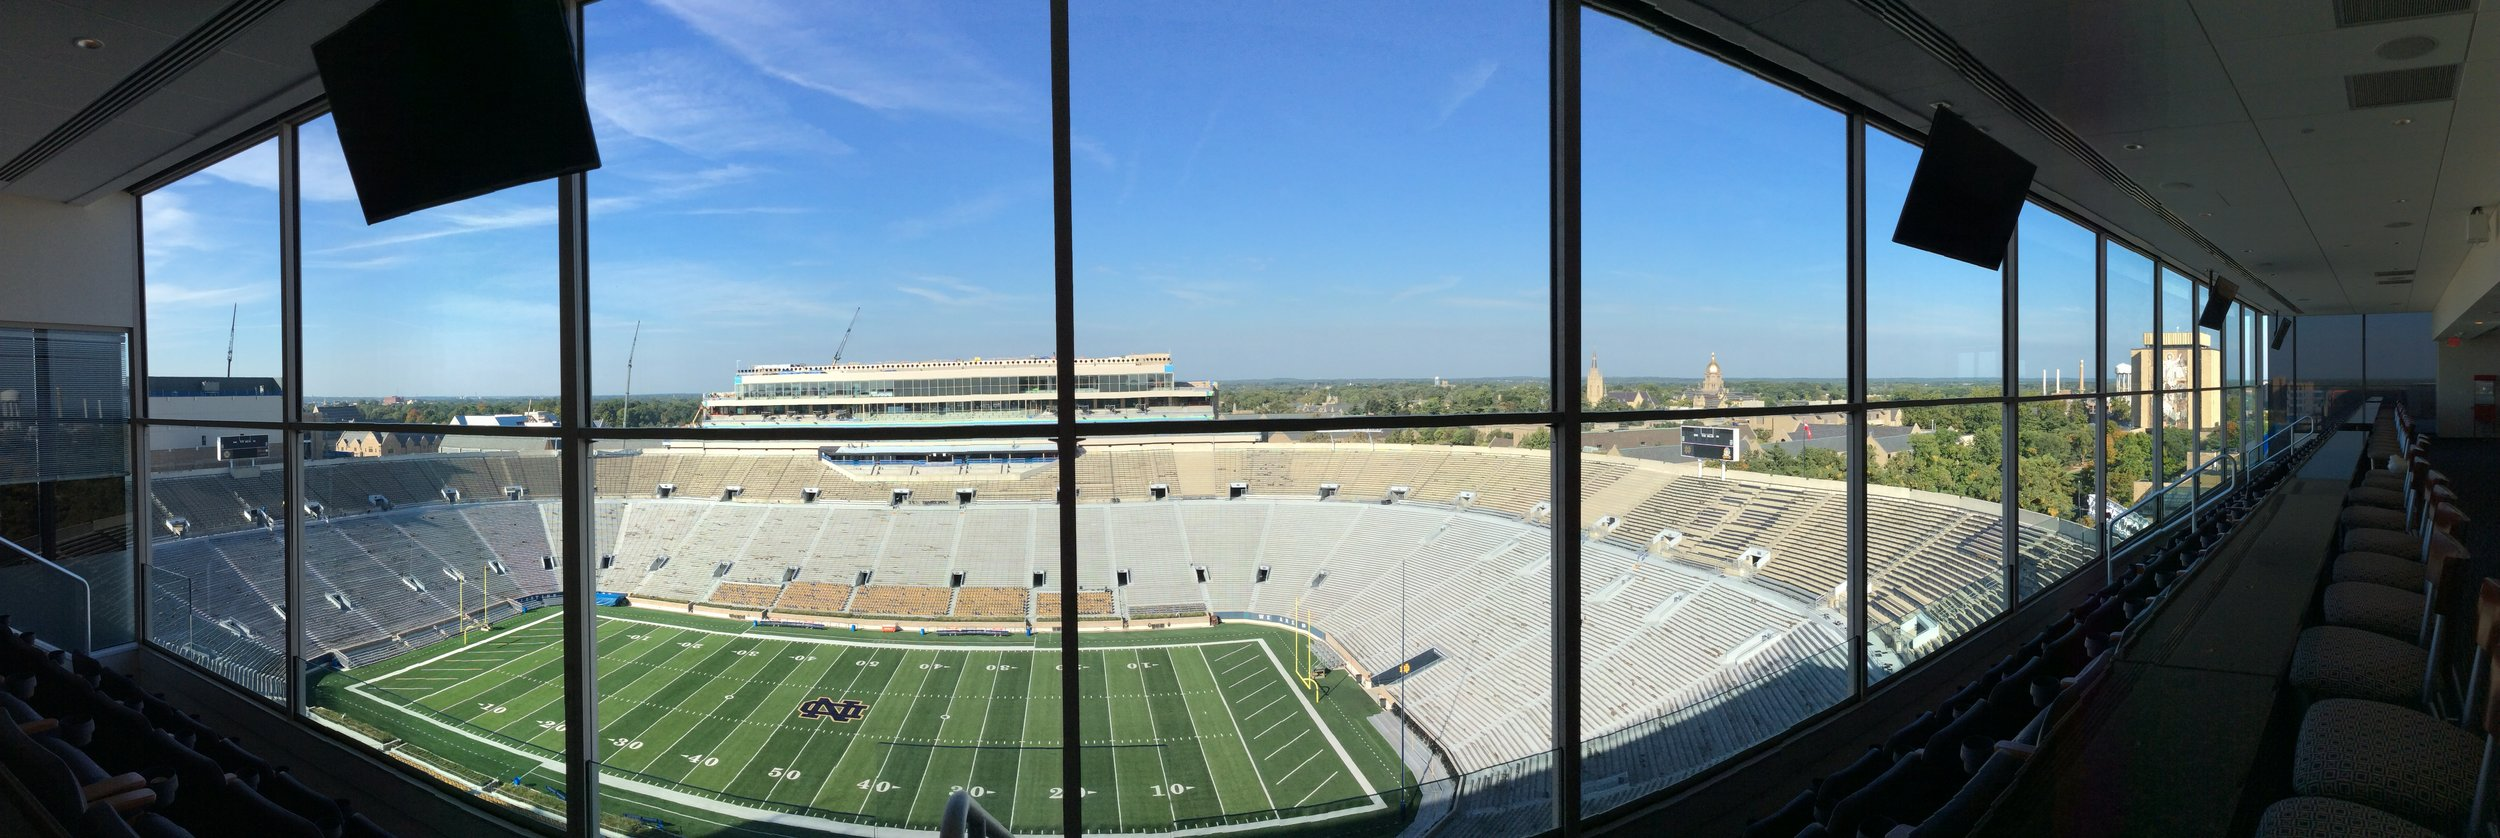 Notre Dame Stadium South Bend, Ia 1.JPG